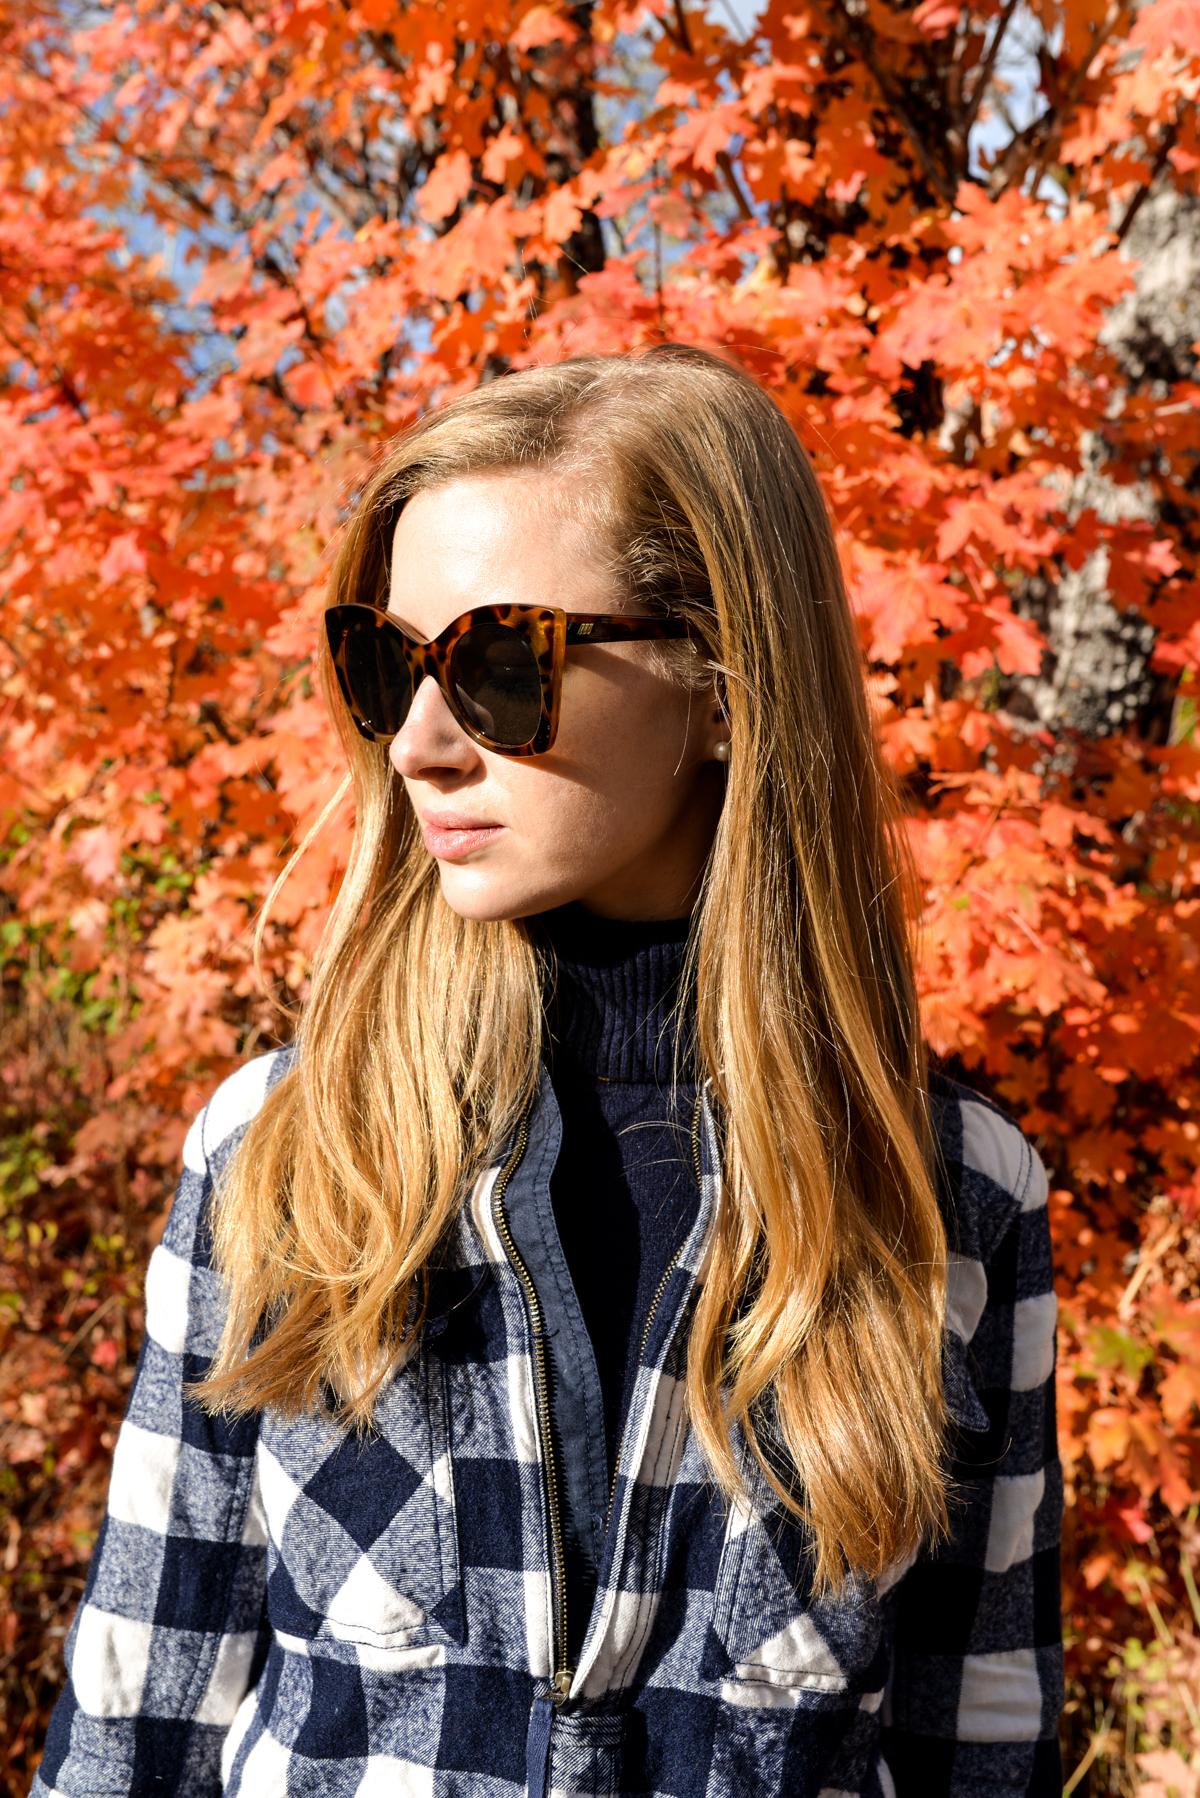 Stacie Flinner Le Specs Sunglasses